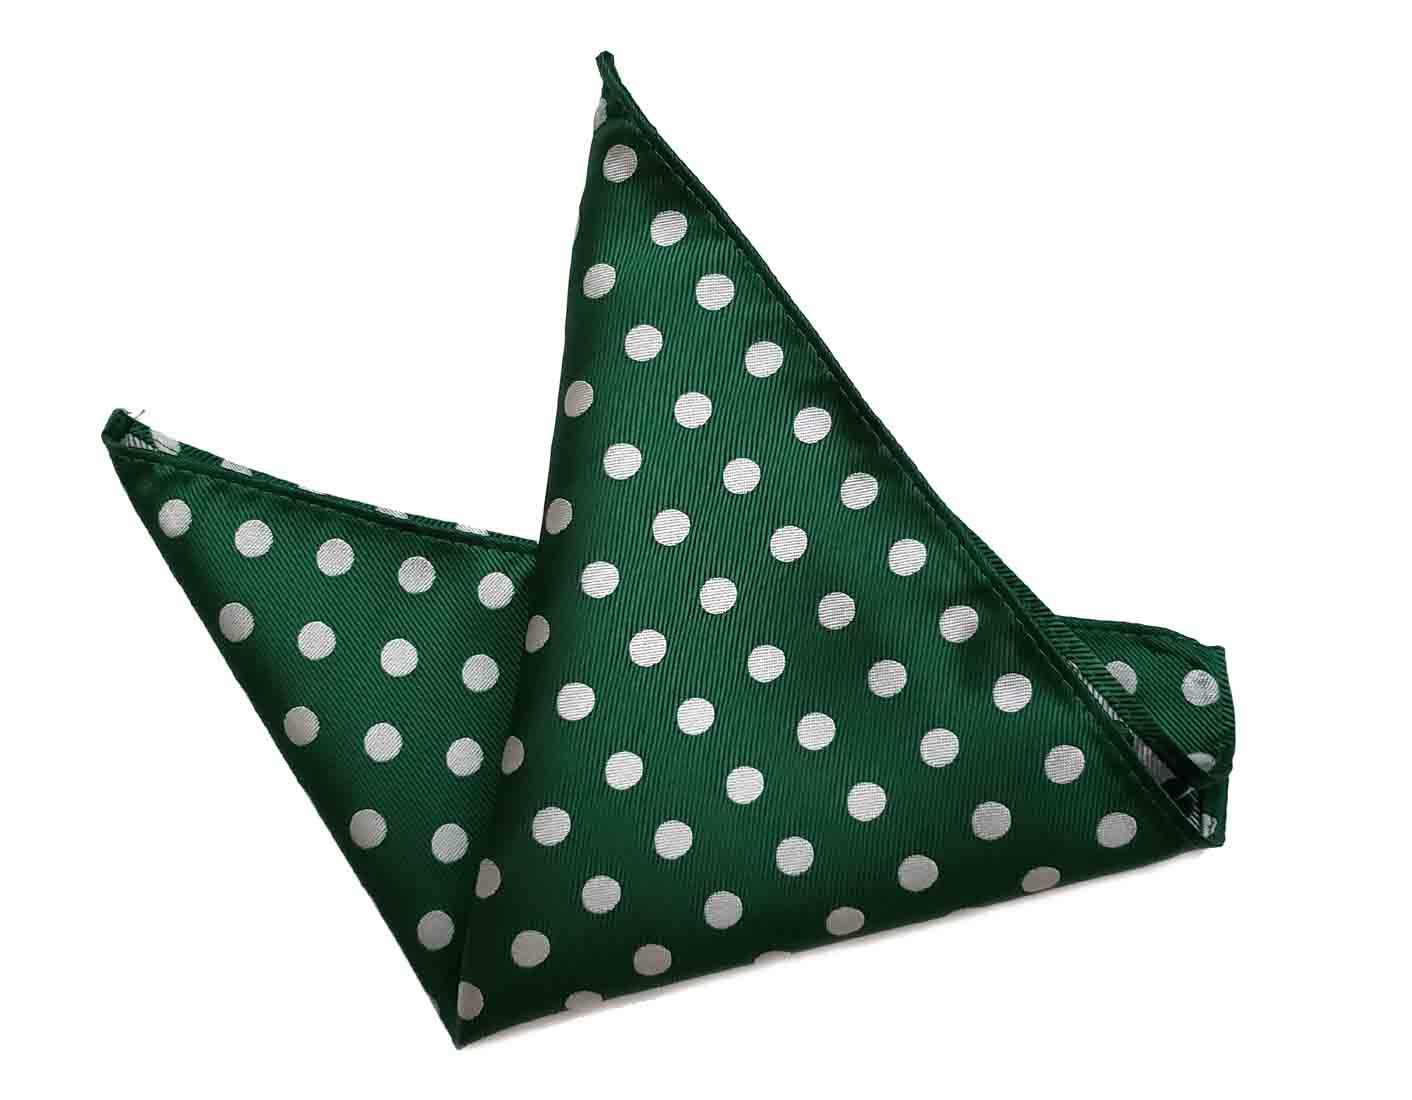 ekSel Pocket Square Green Gray Polka Dot Pattern Men's